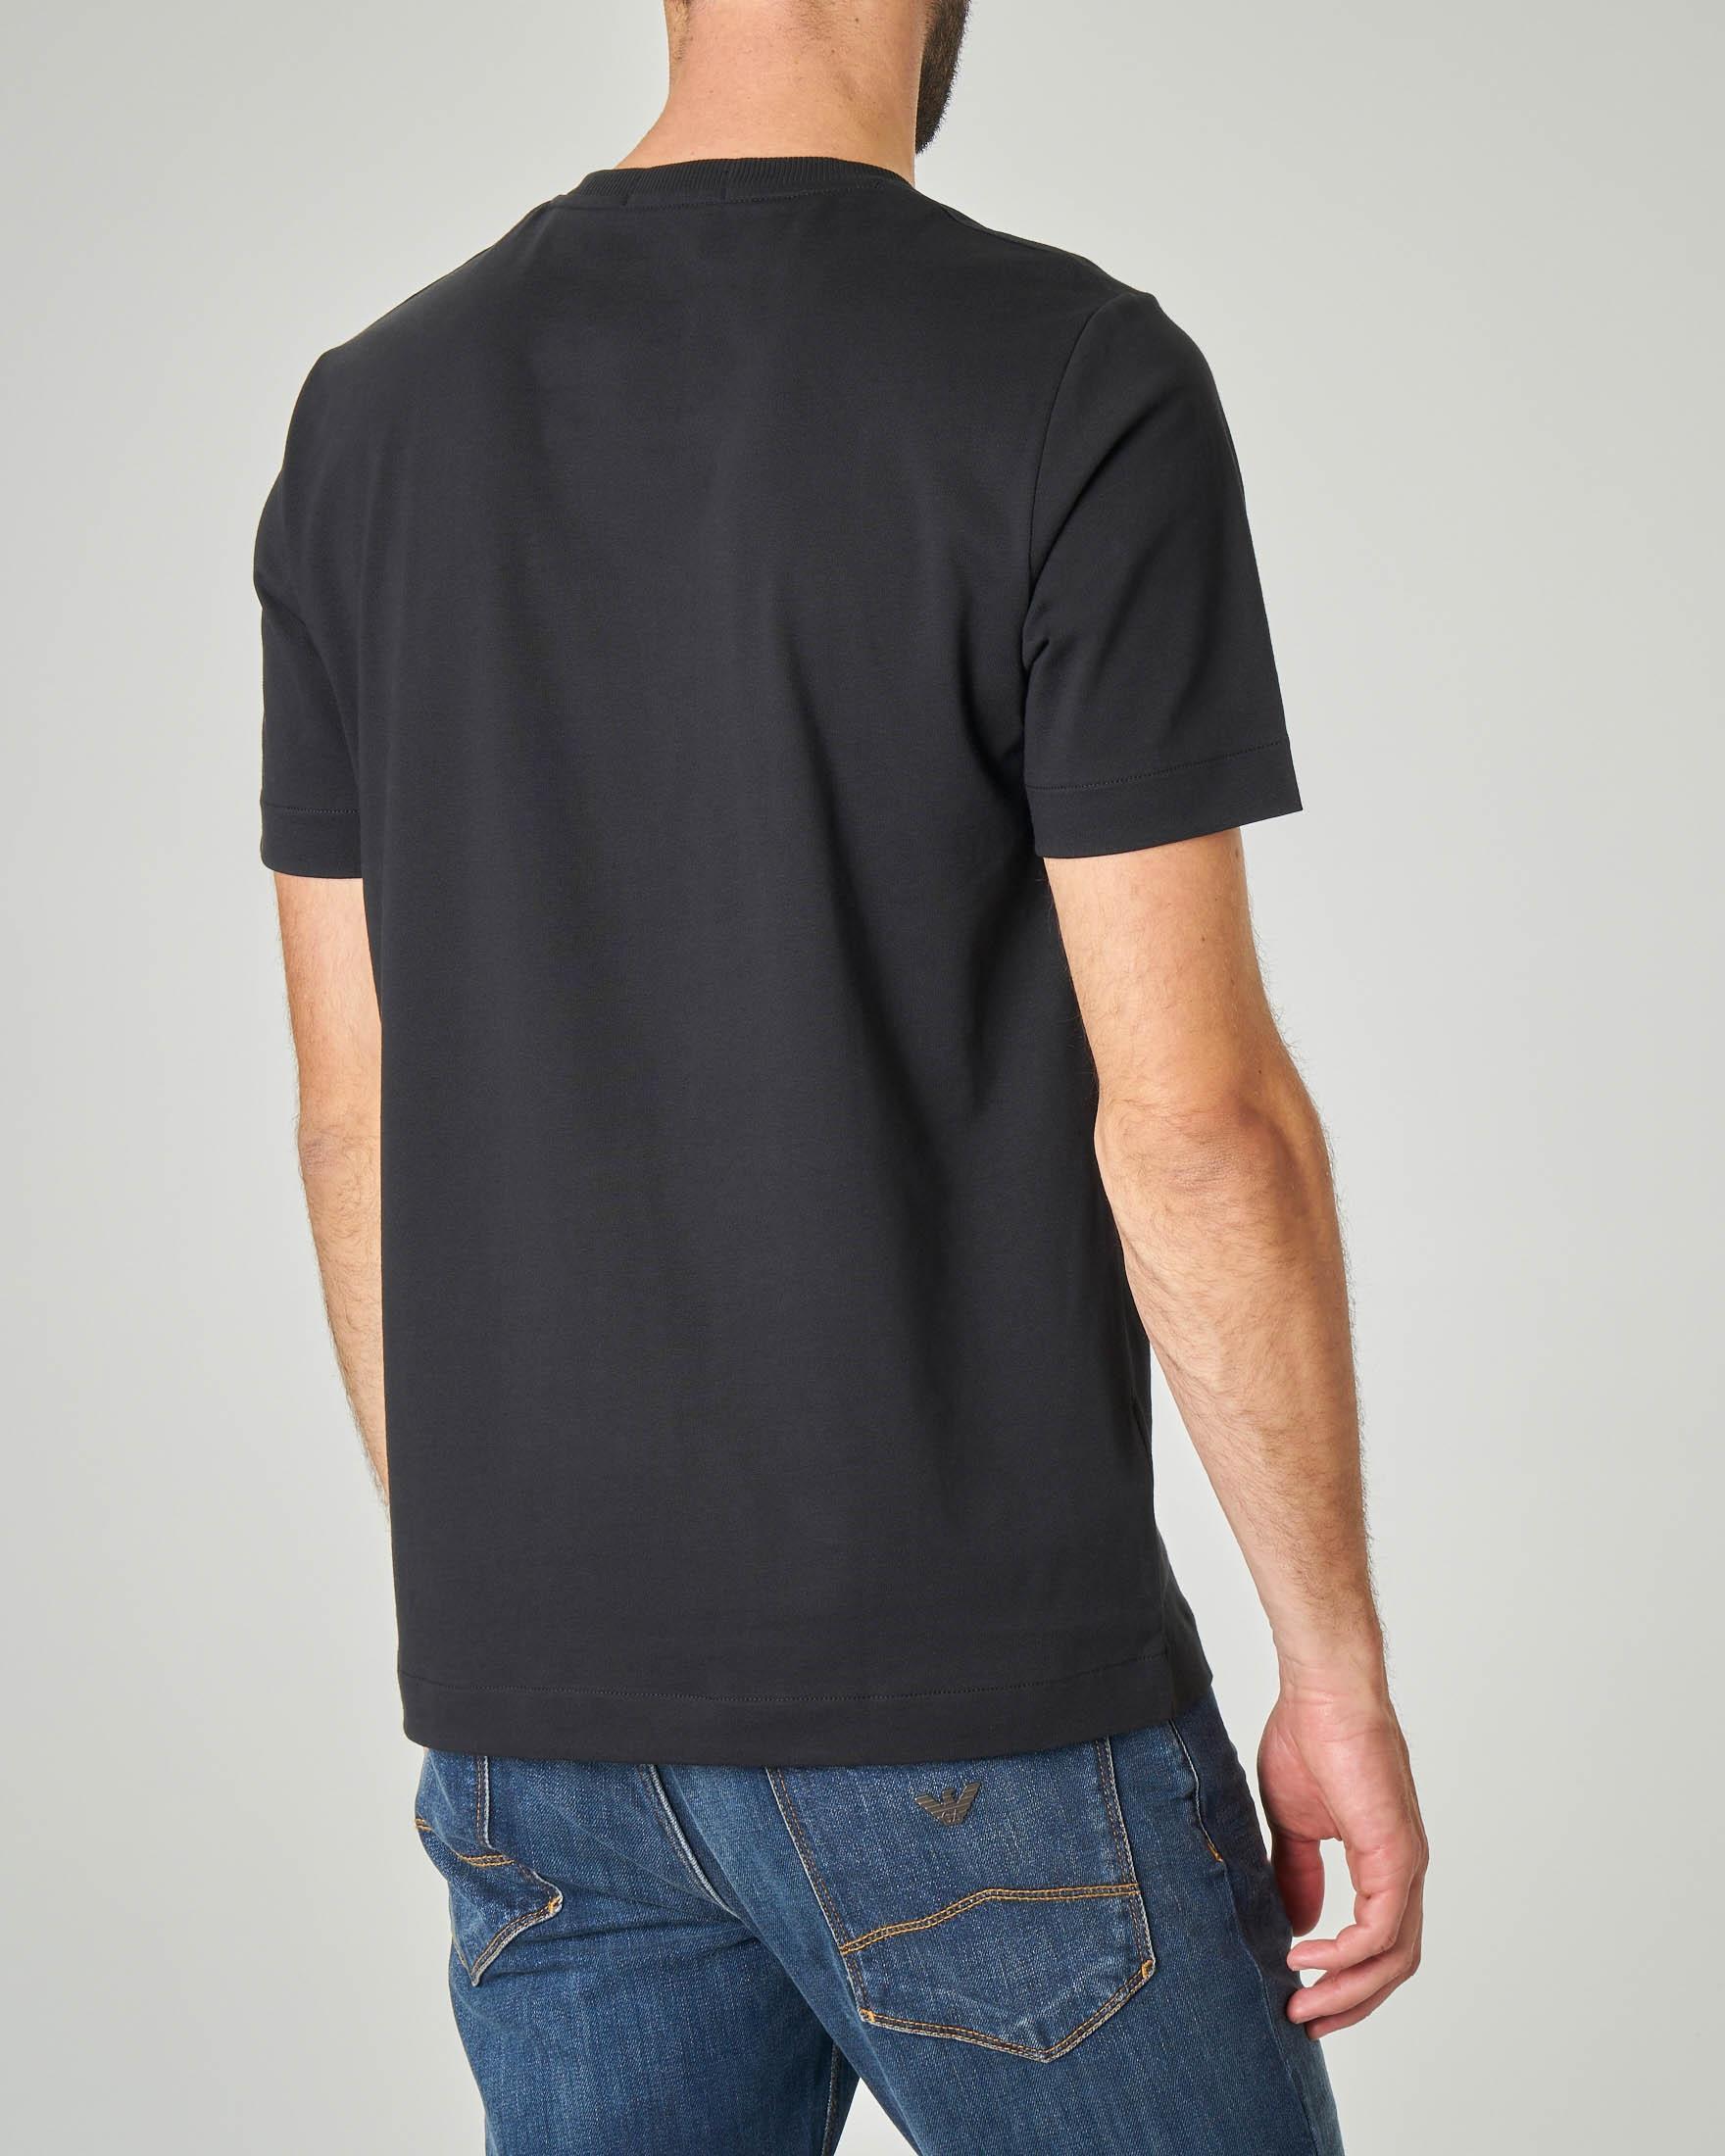 T-shirt nera con patch bianco e logo stampato